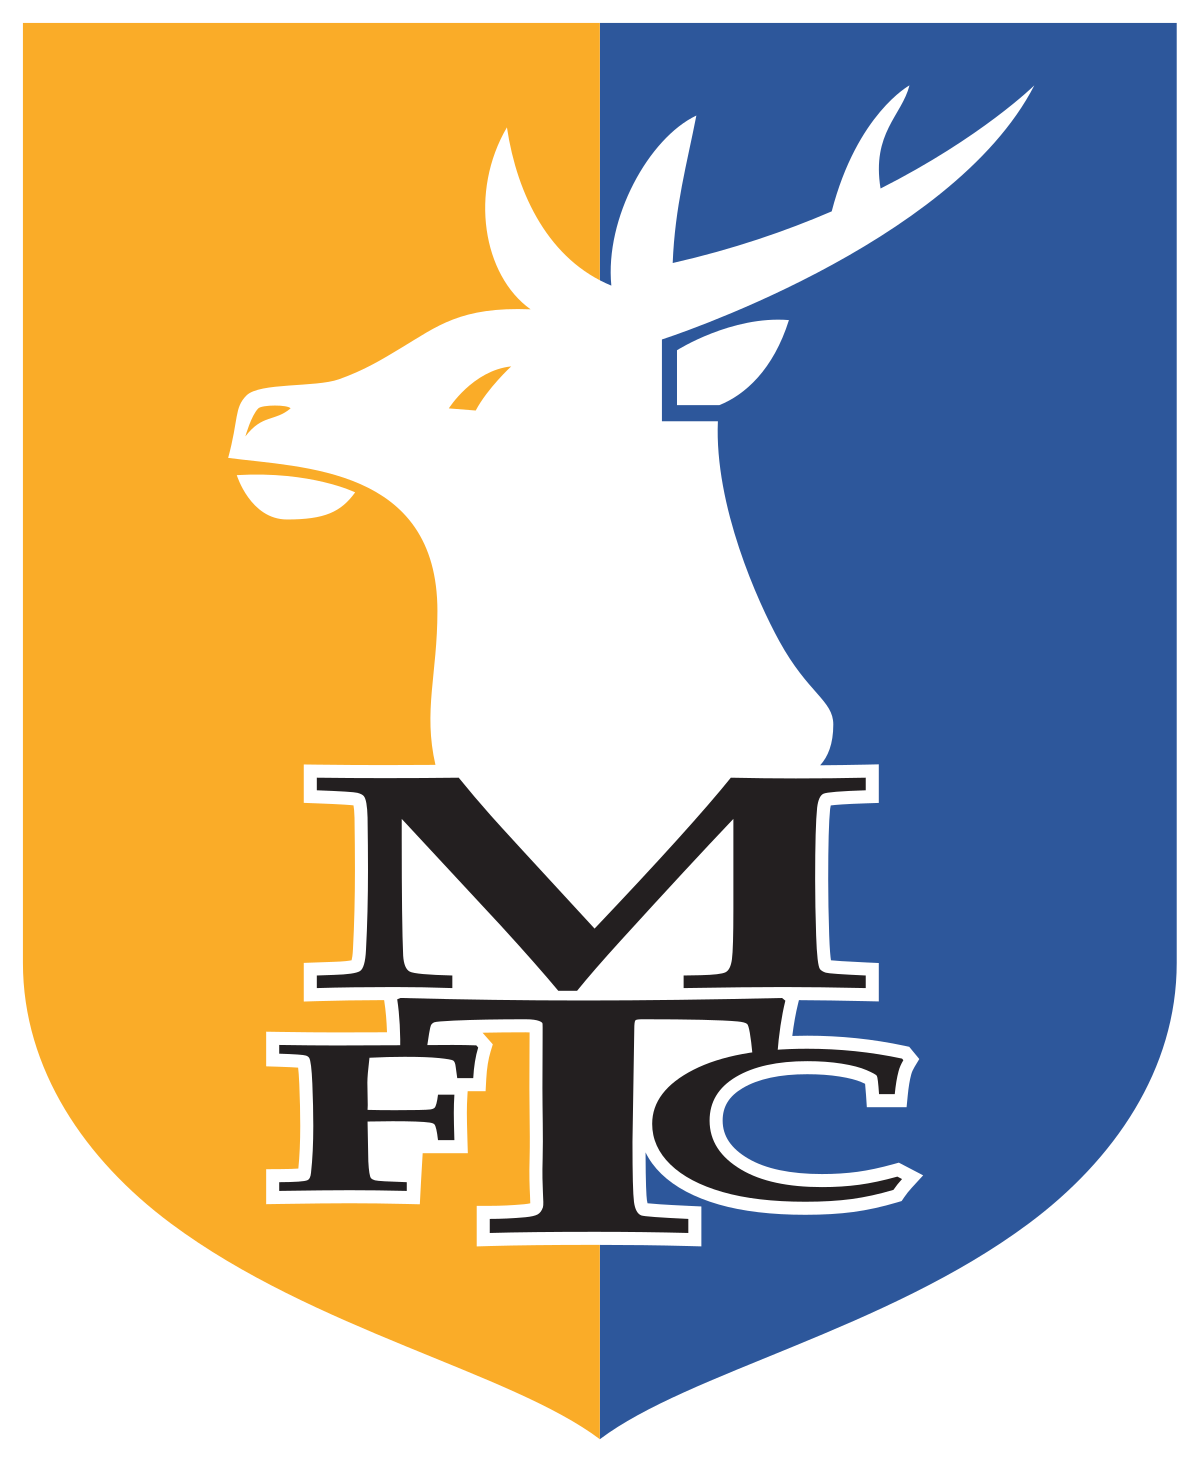 Mansfield Town Football Club